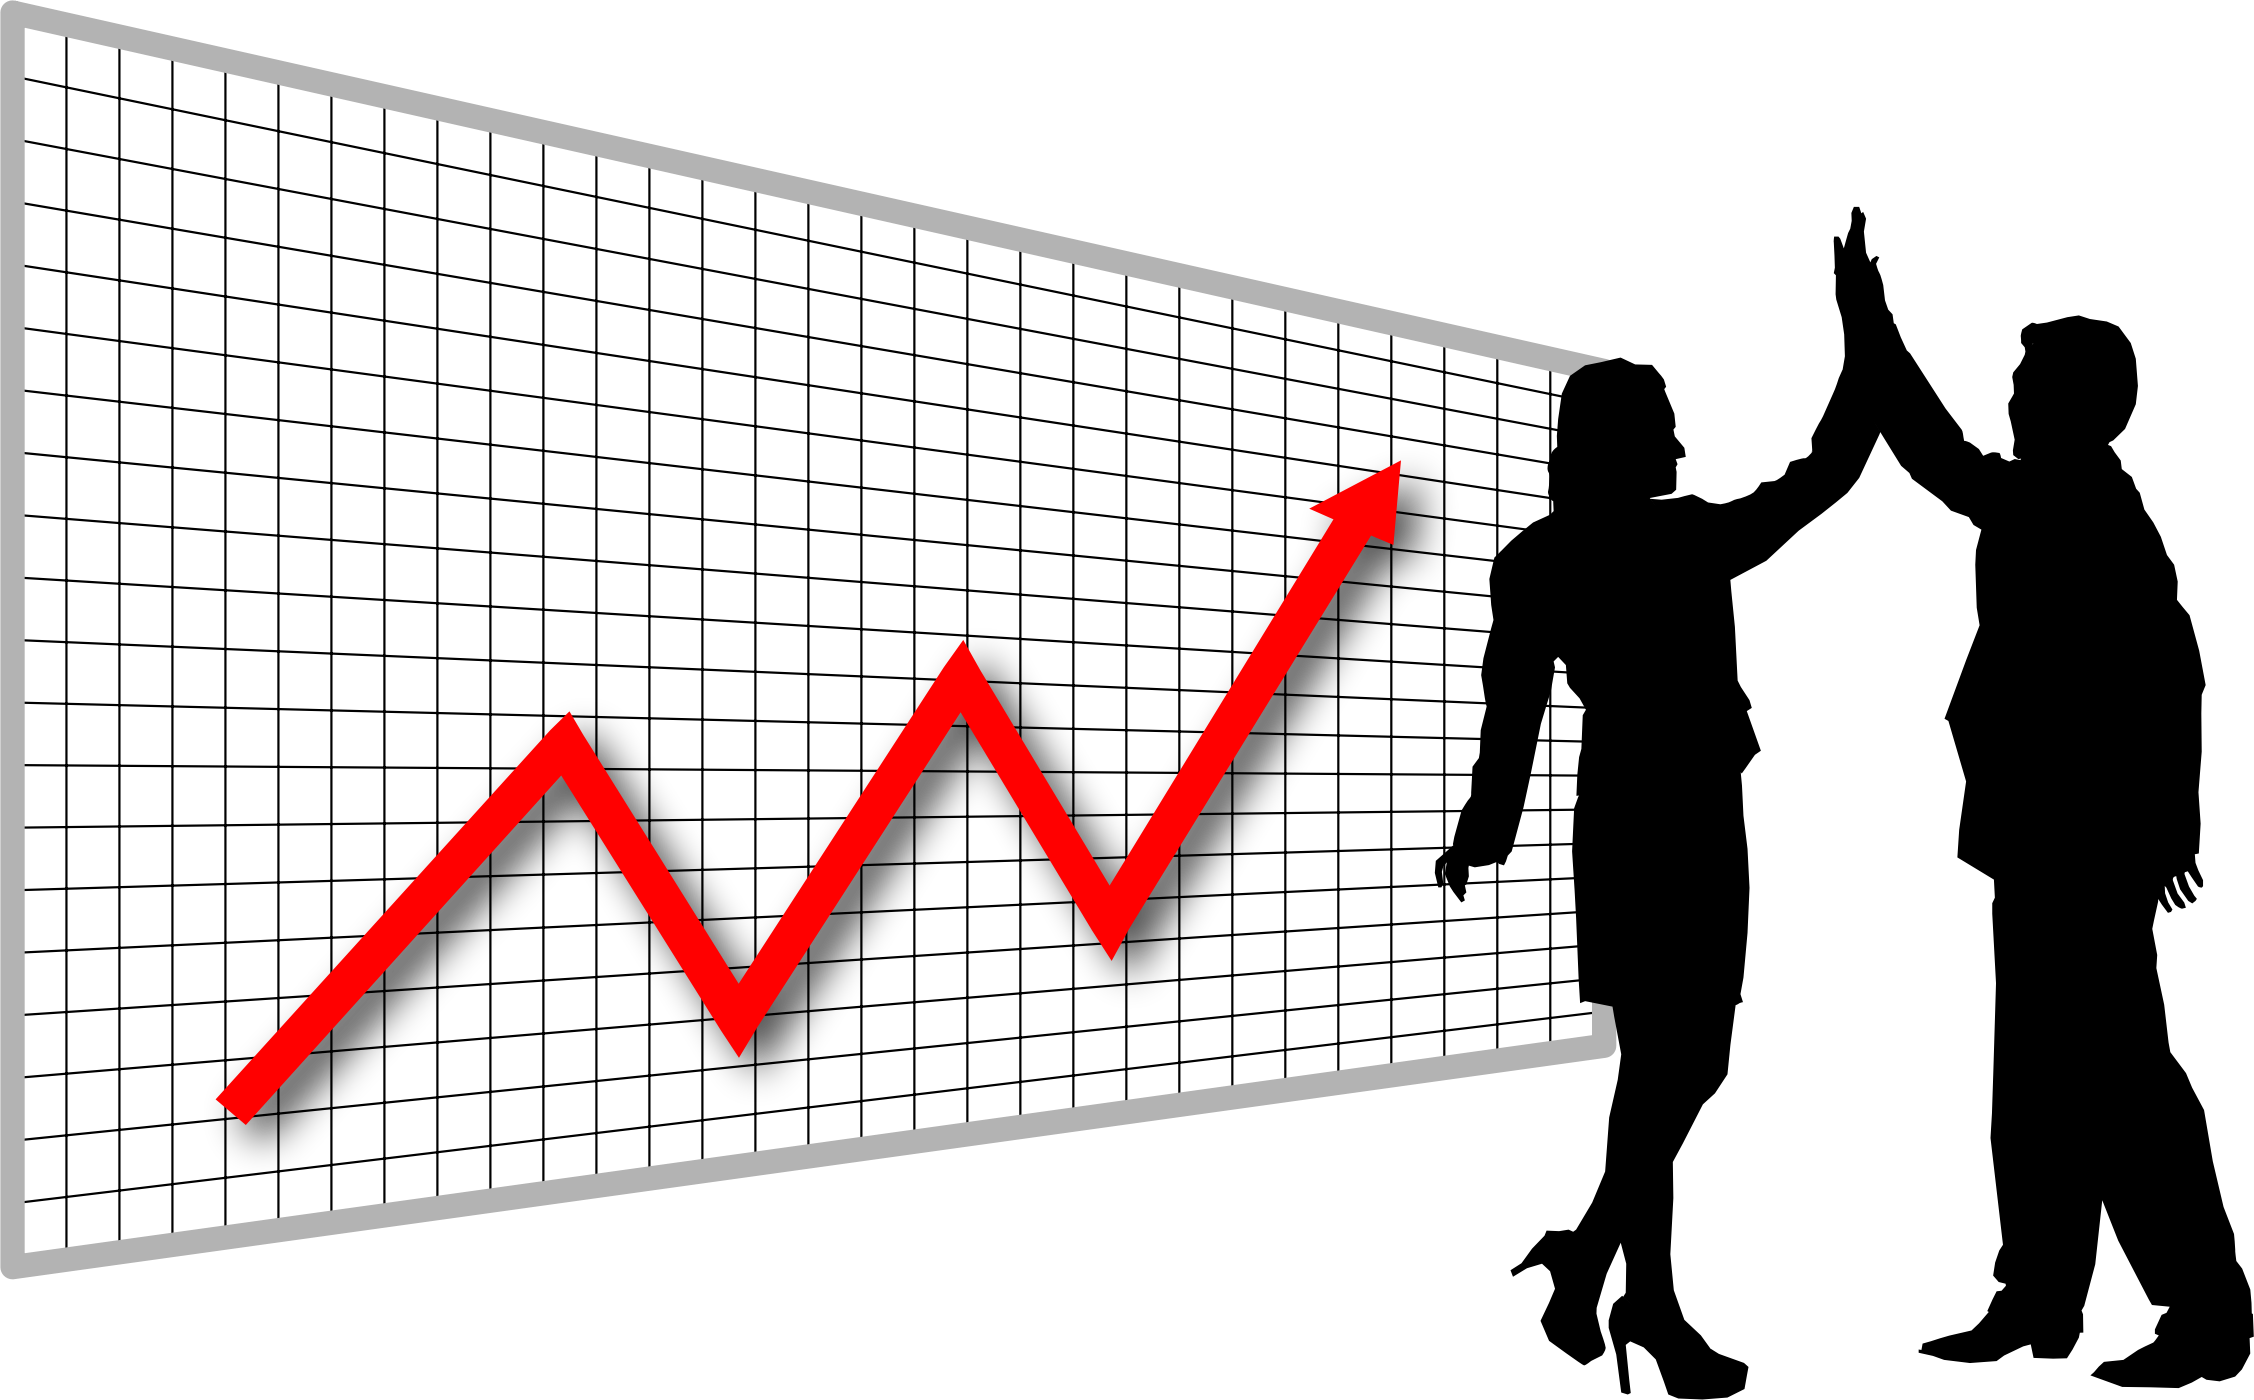 Motivation clipart net profit. Highfive perspective simpletutorials profitclipartprofithighfiveperspectivesimpletutorialsnet